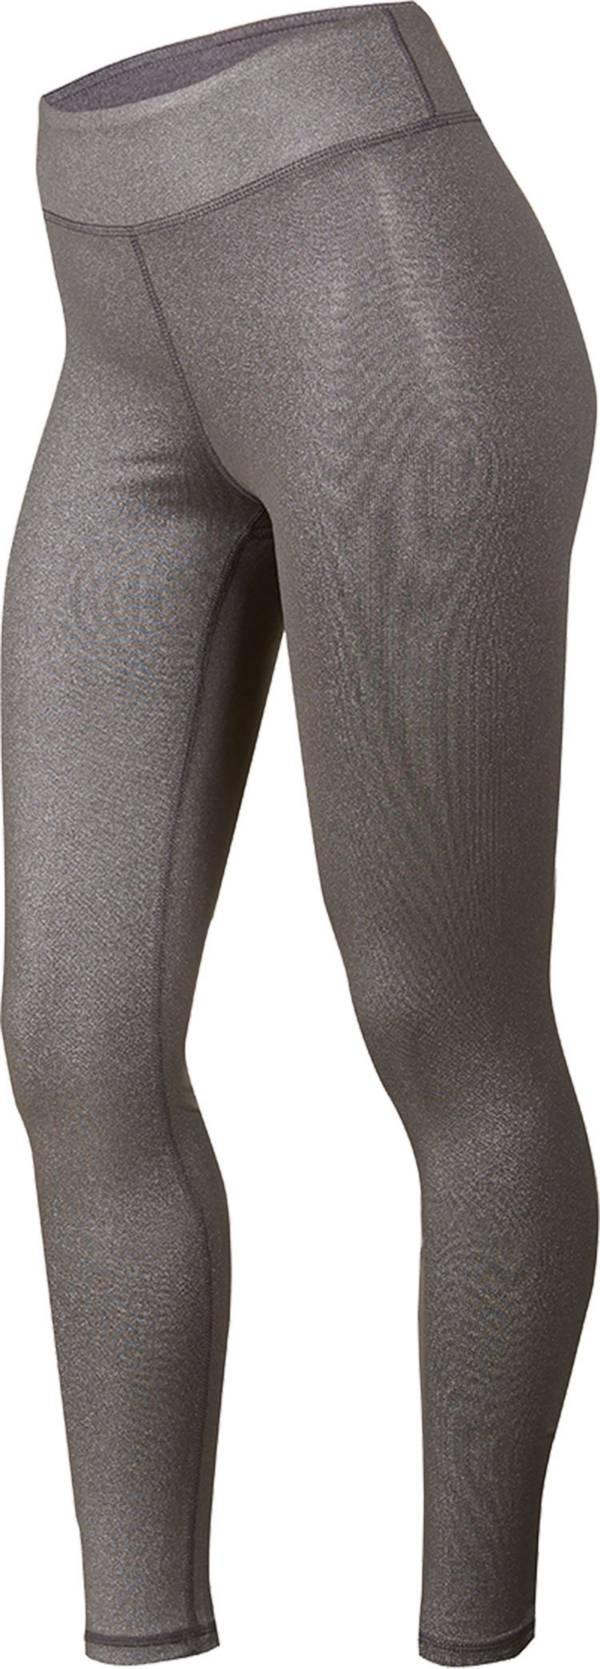 Soffe Juniors' Plus Size Slay Metallic Leggings product image